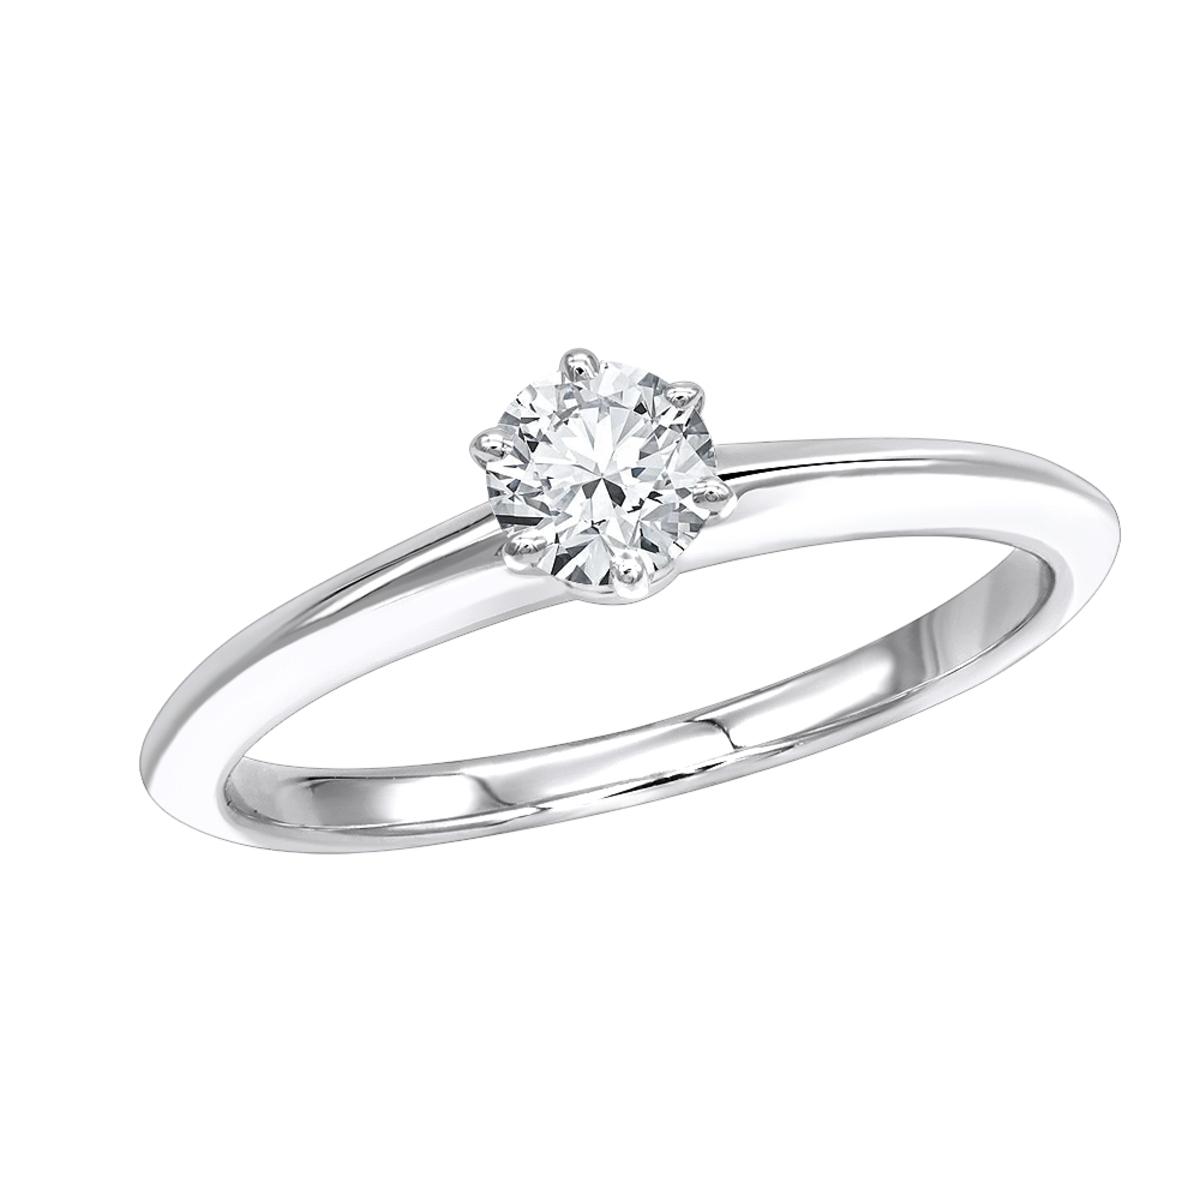 Authentic Tiffany & Co Platinum Diamond Engagement Ring 0.32ct